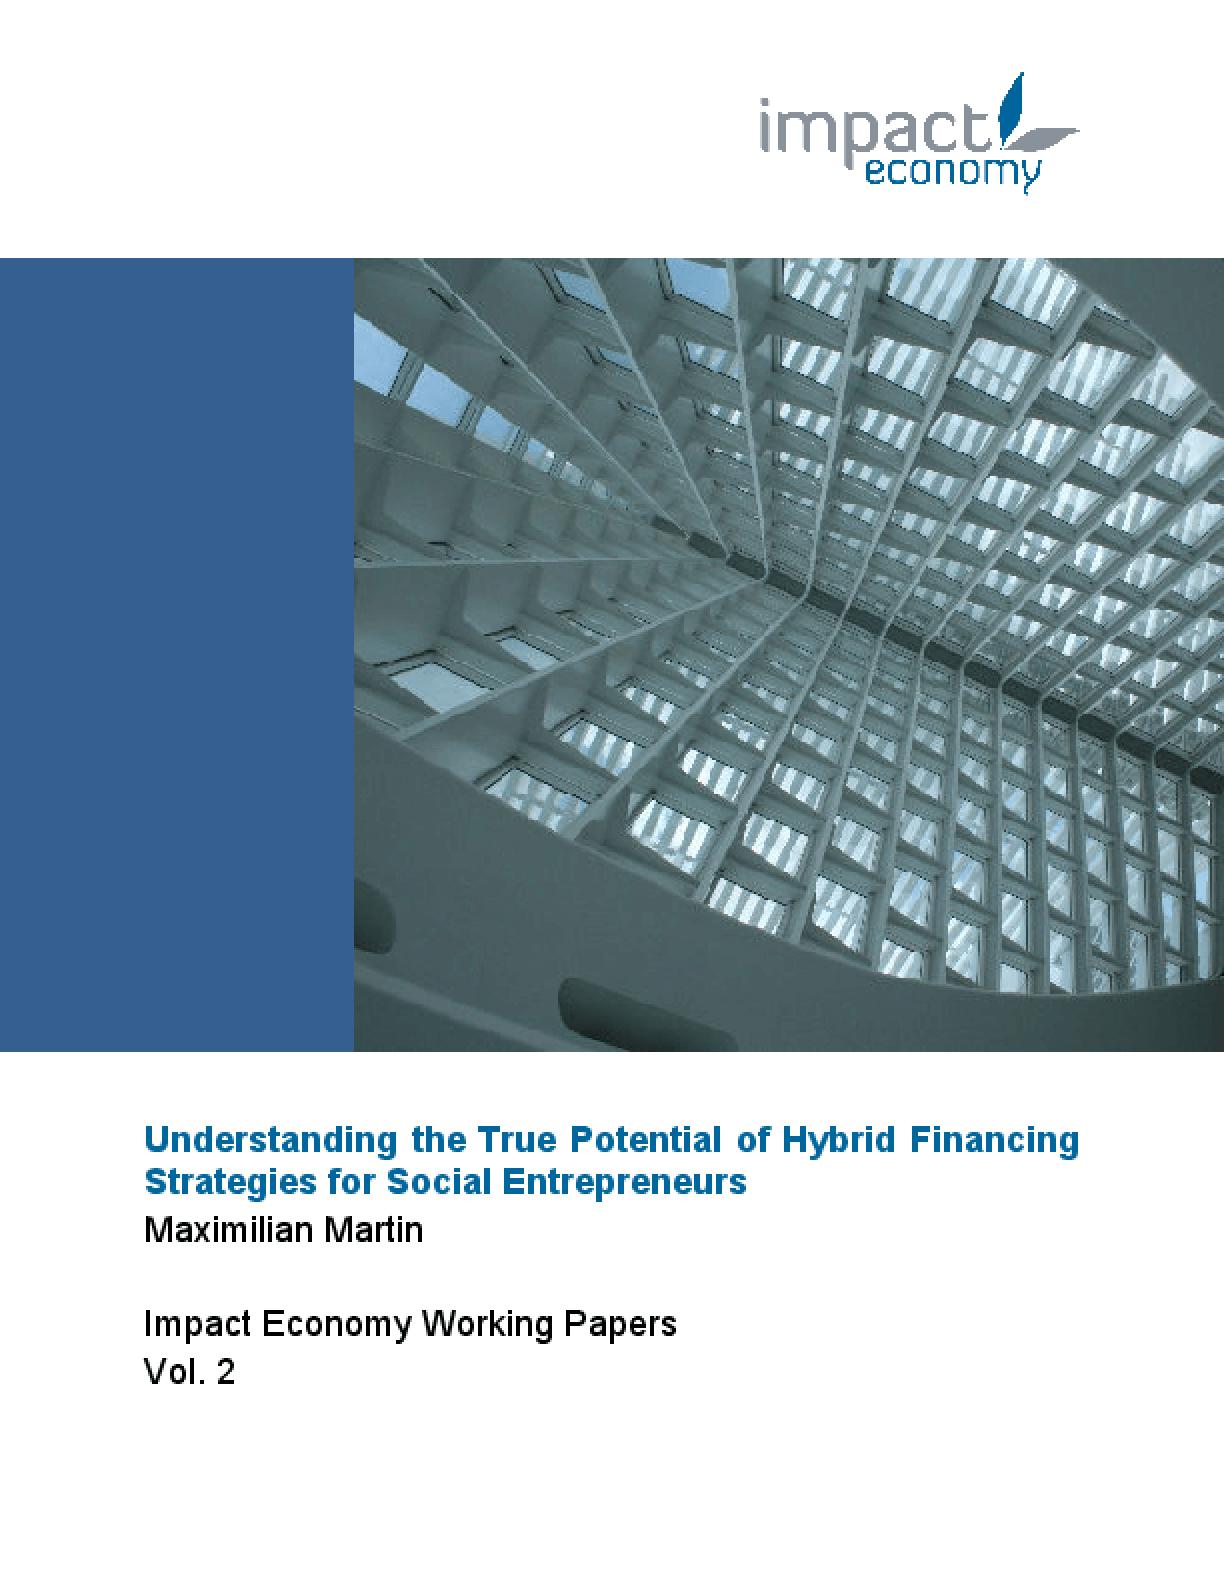 Understanding the True Potential of Hybrid Financing Strategies for Social Entrepreneurs